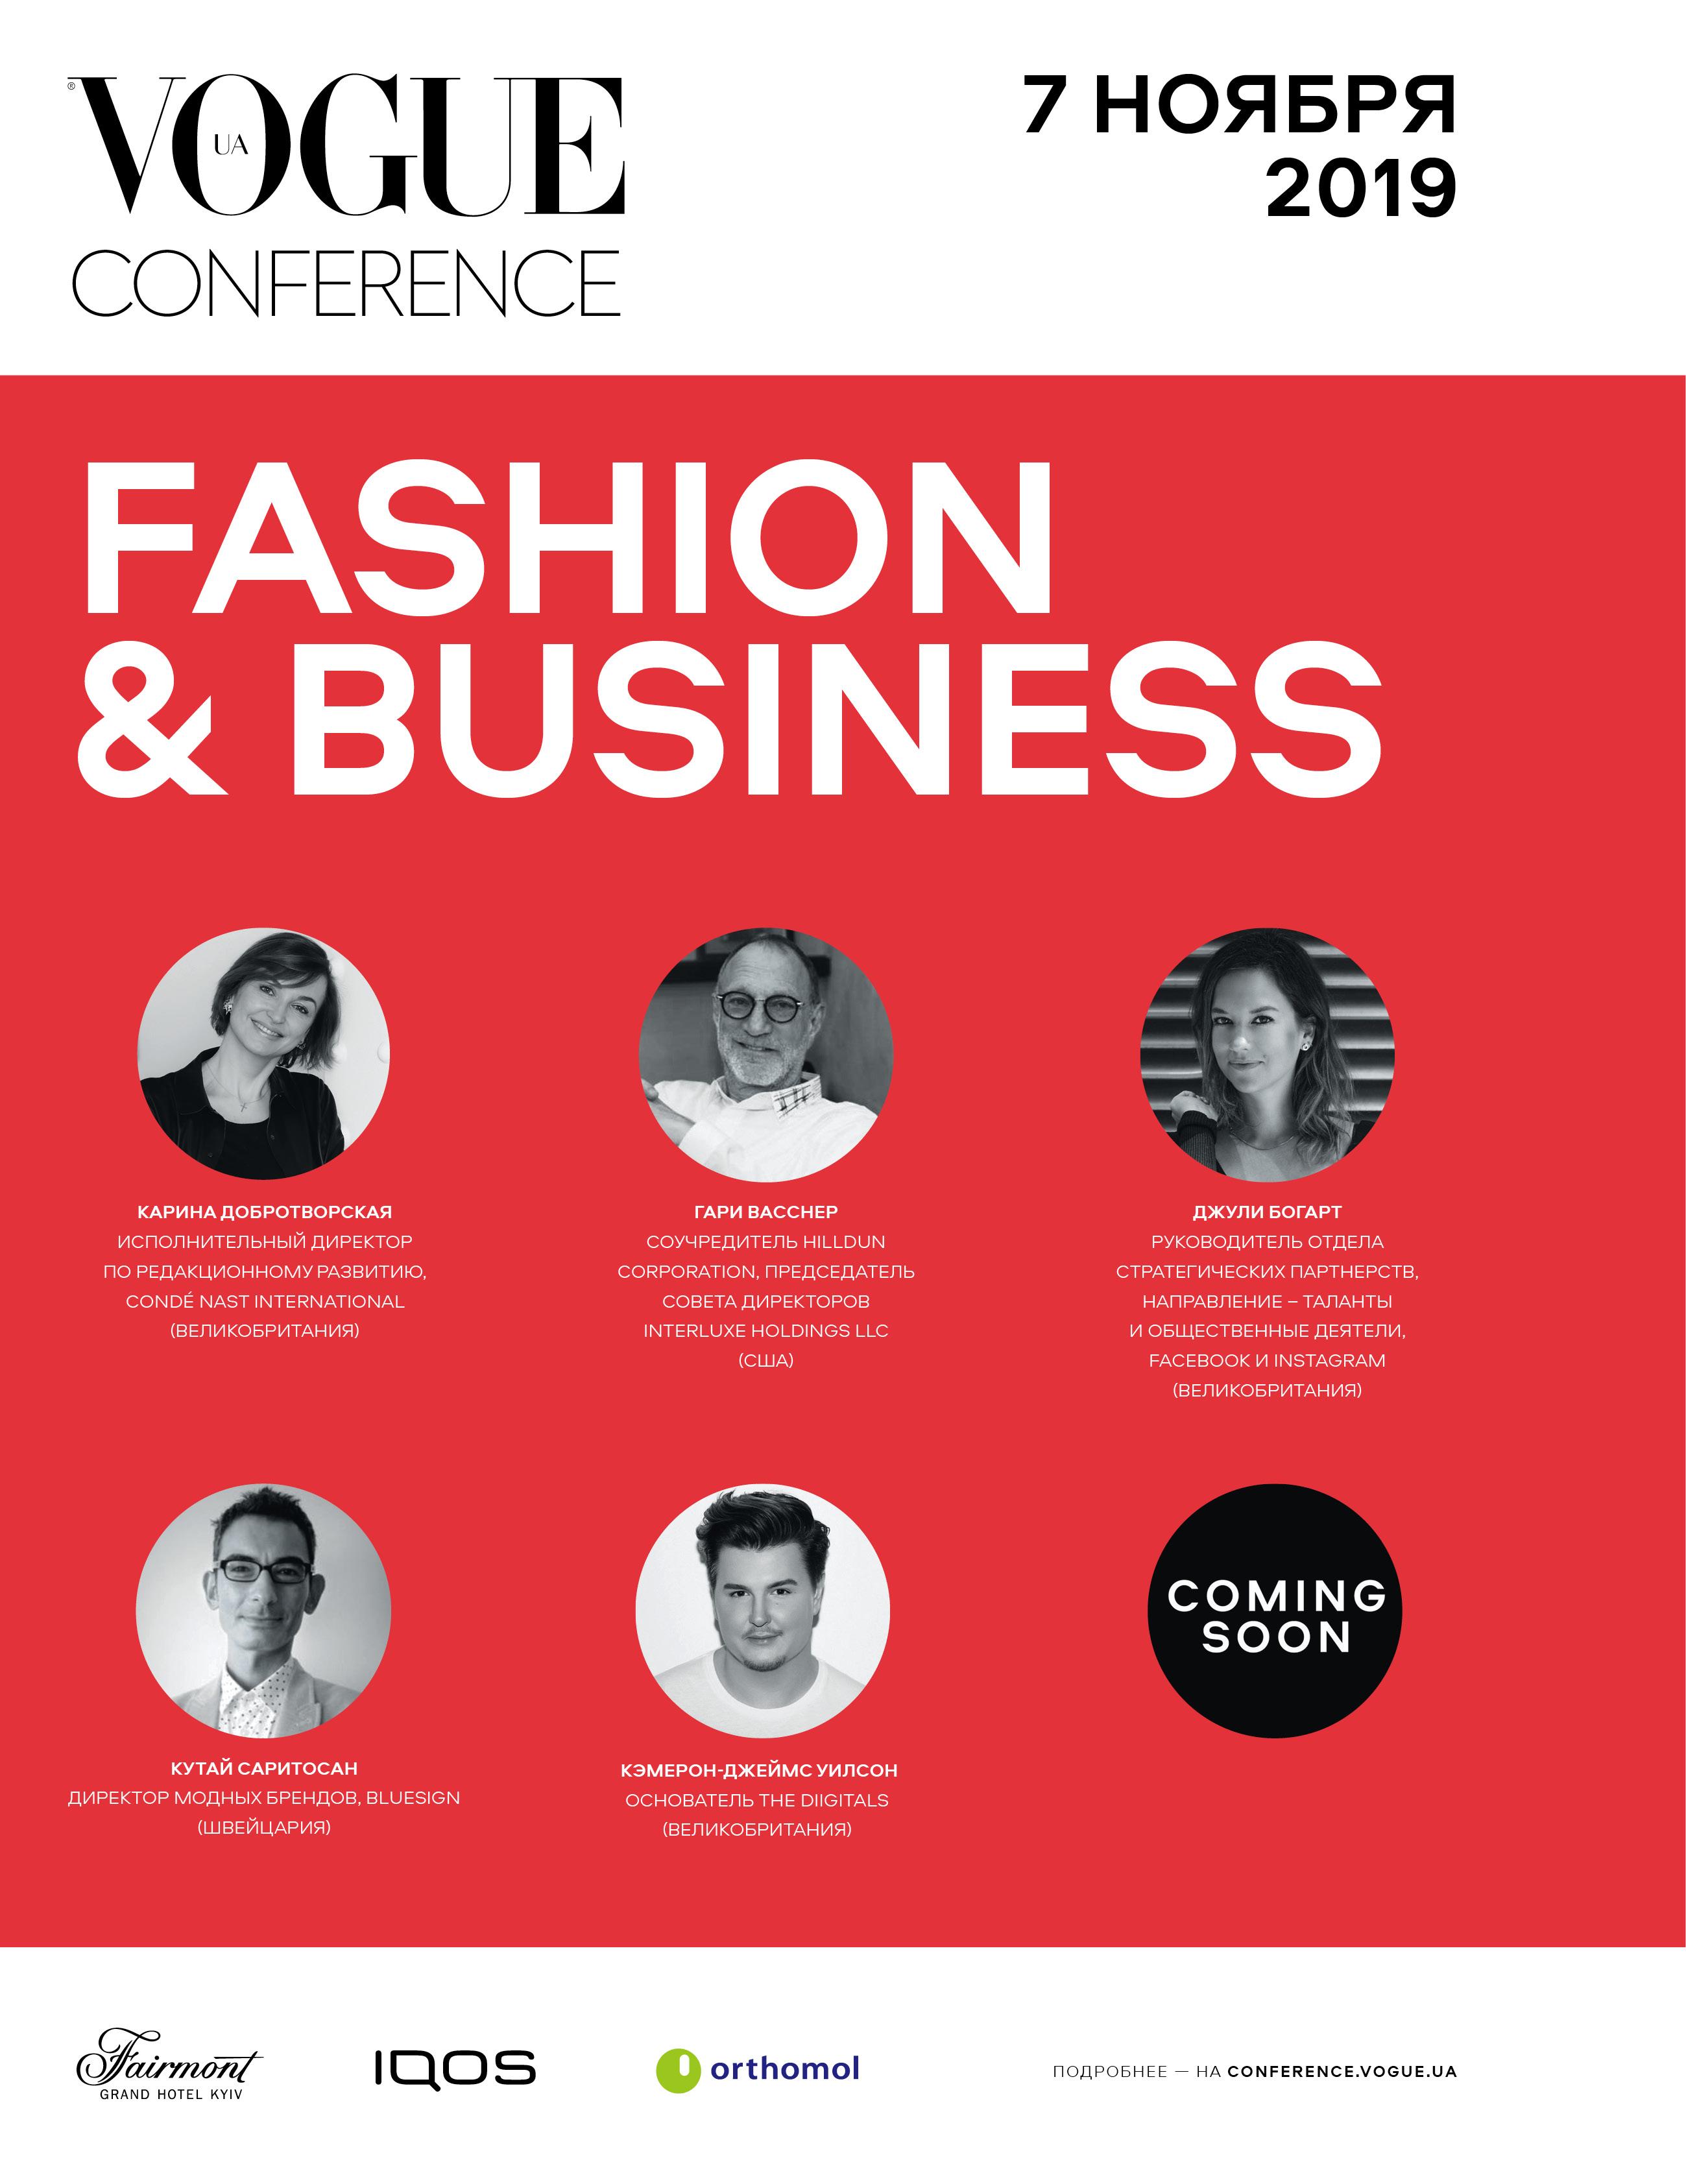 Conference Vogue Ua